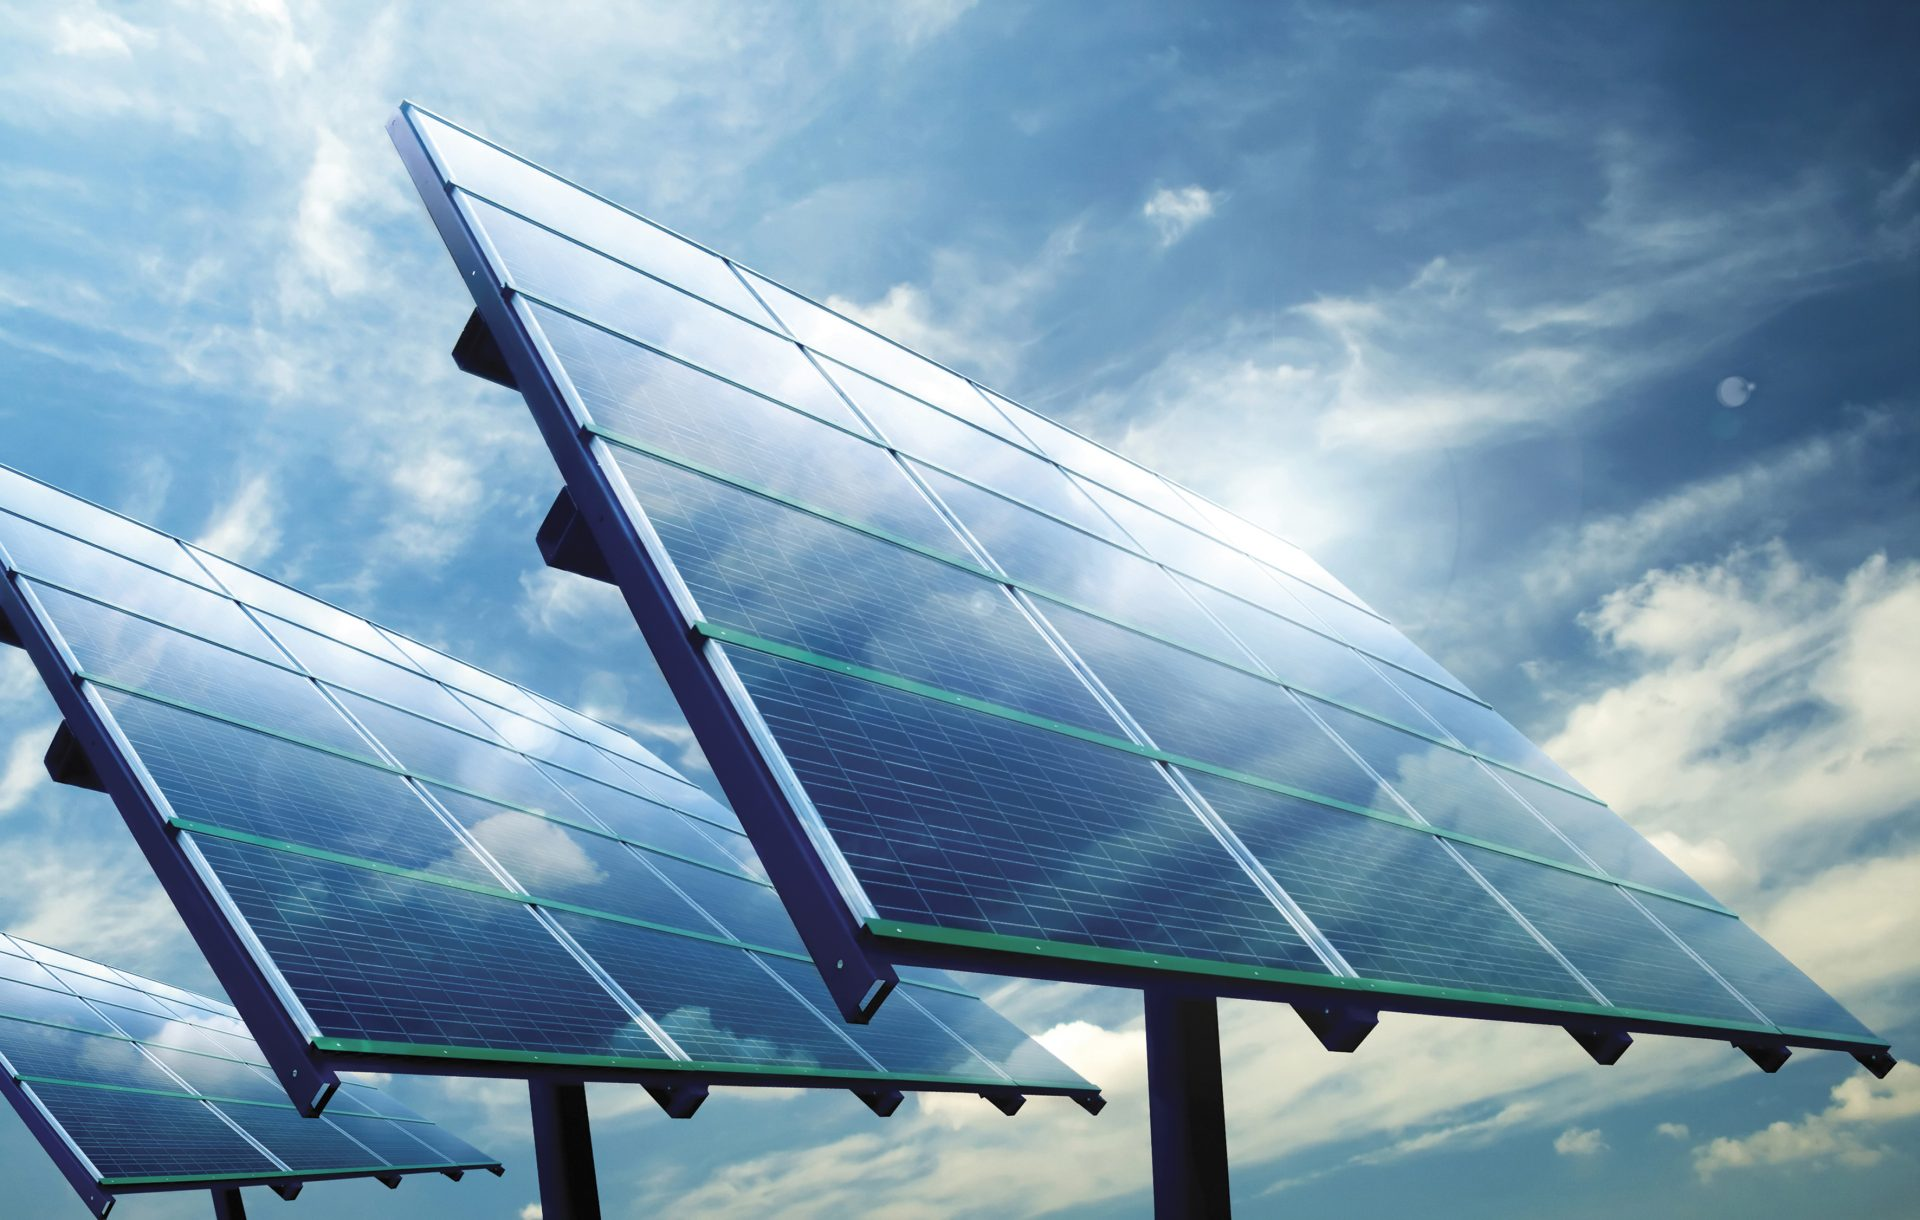 futuro da energia solar